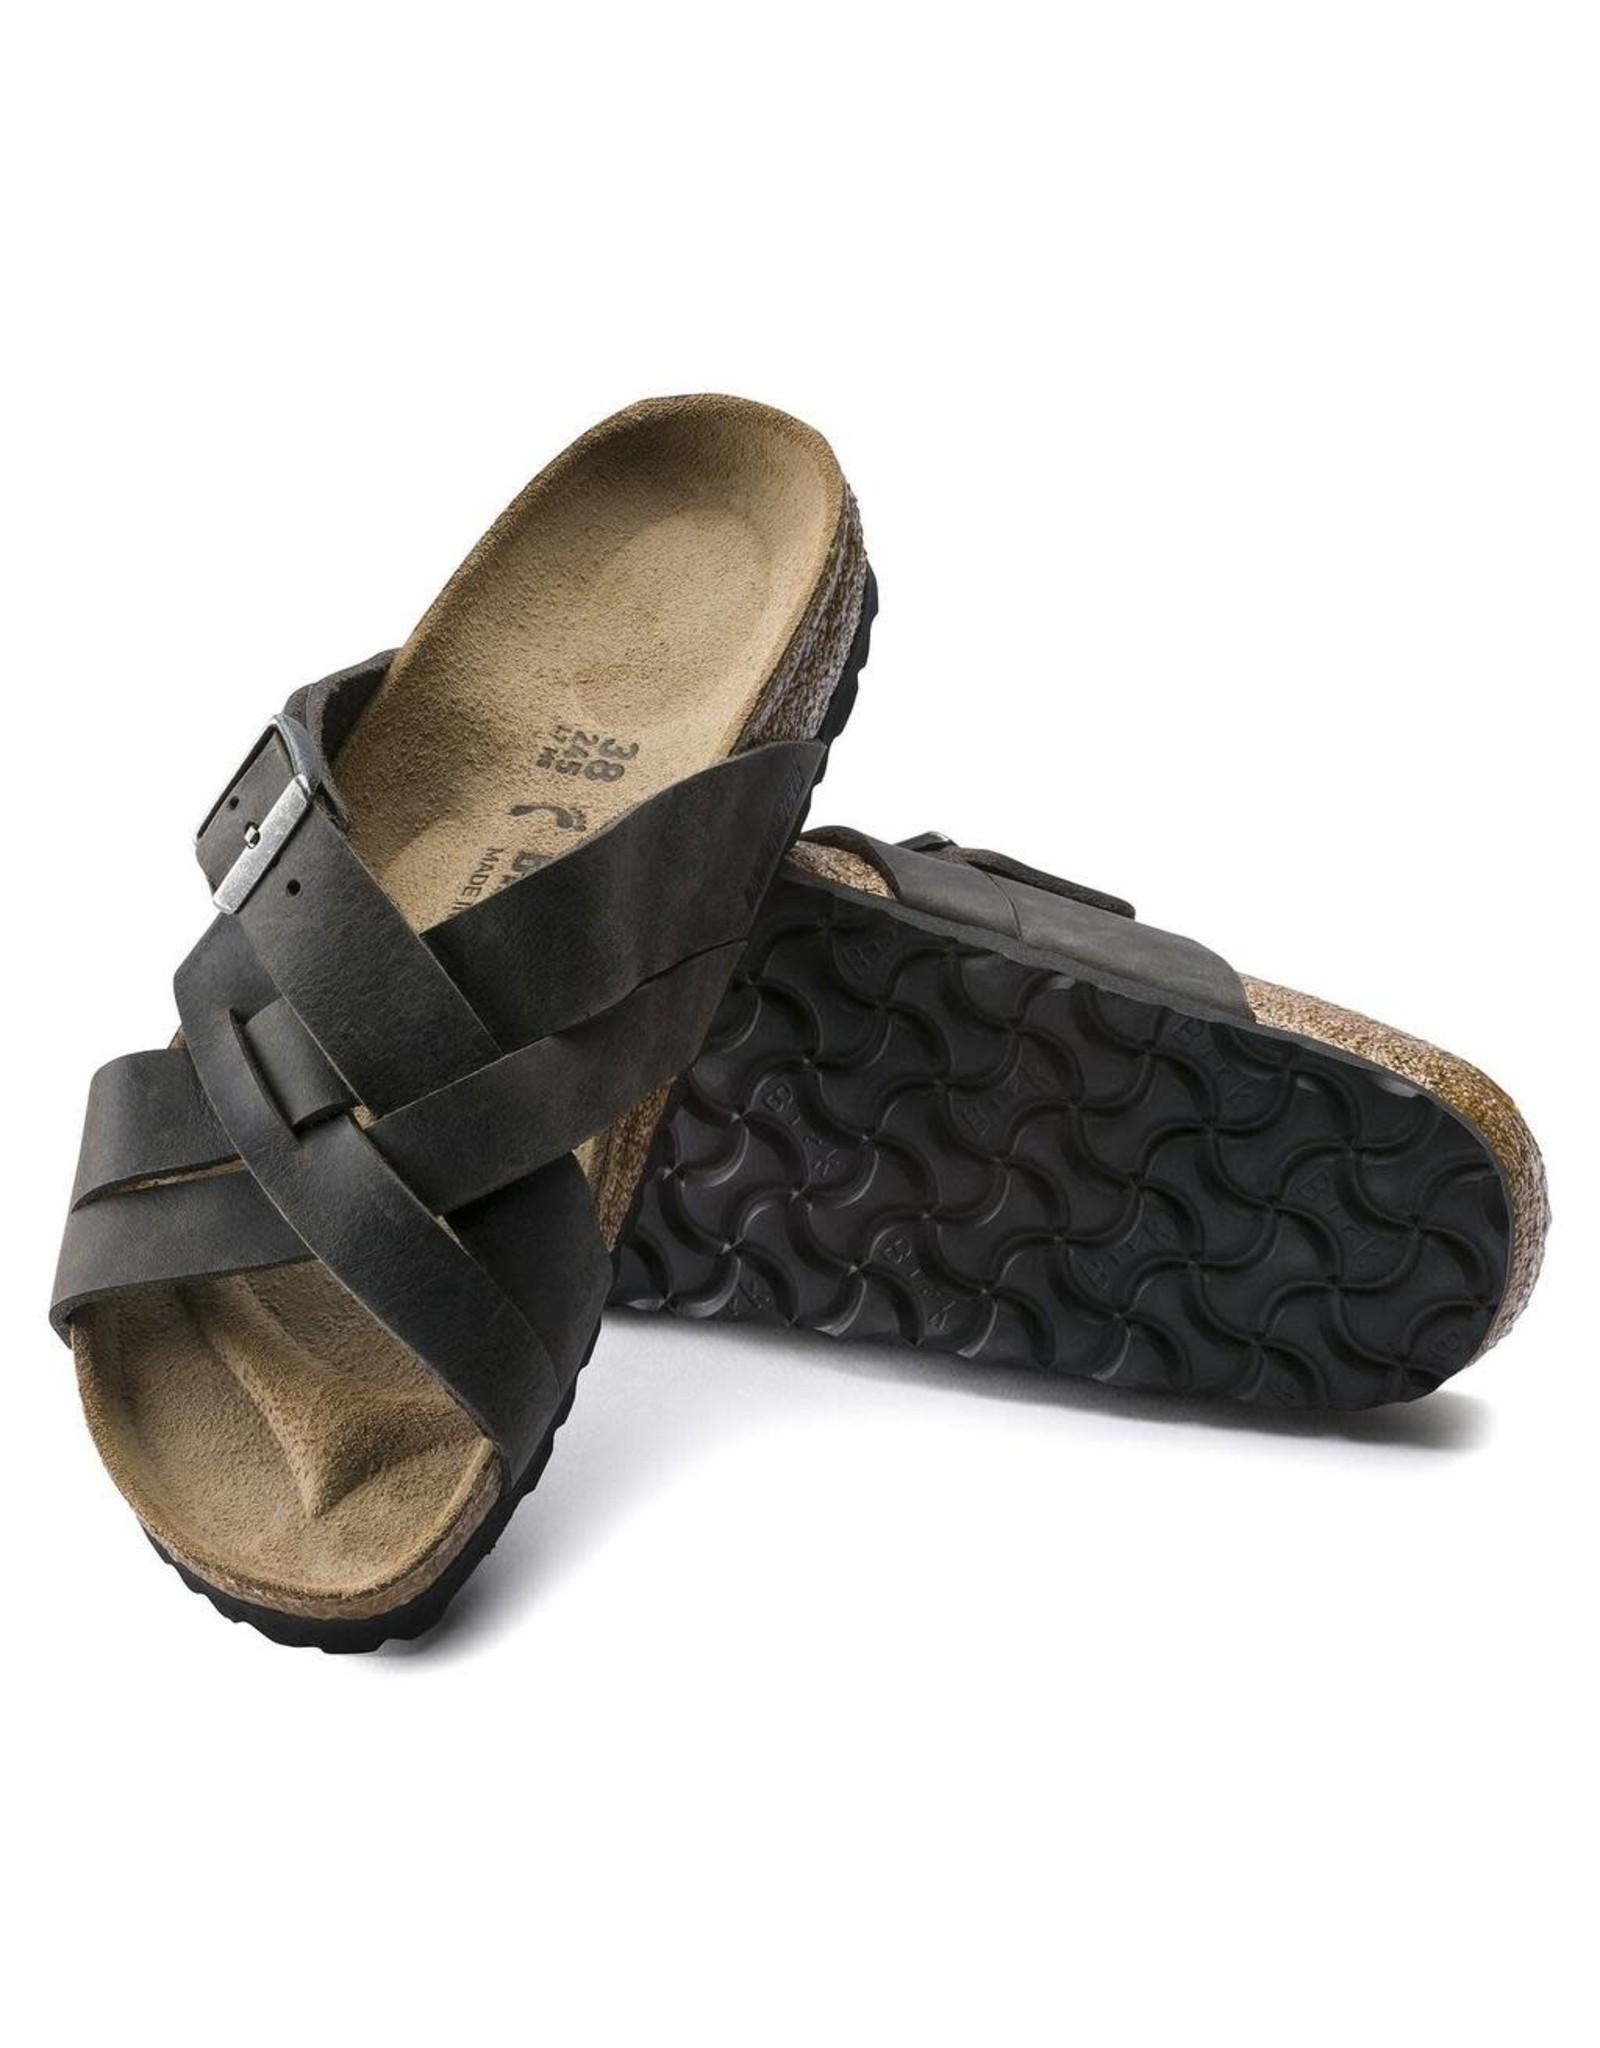 Birkenstock Lugano Sandal Camberra Iron Leather